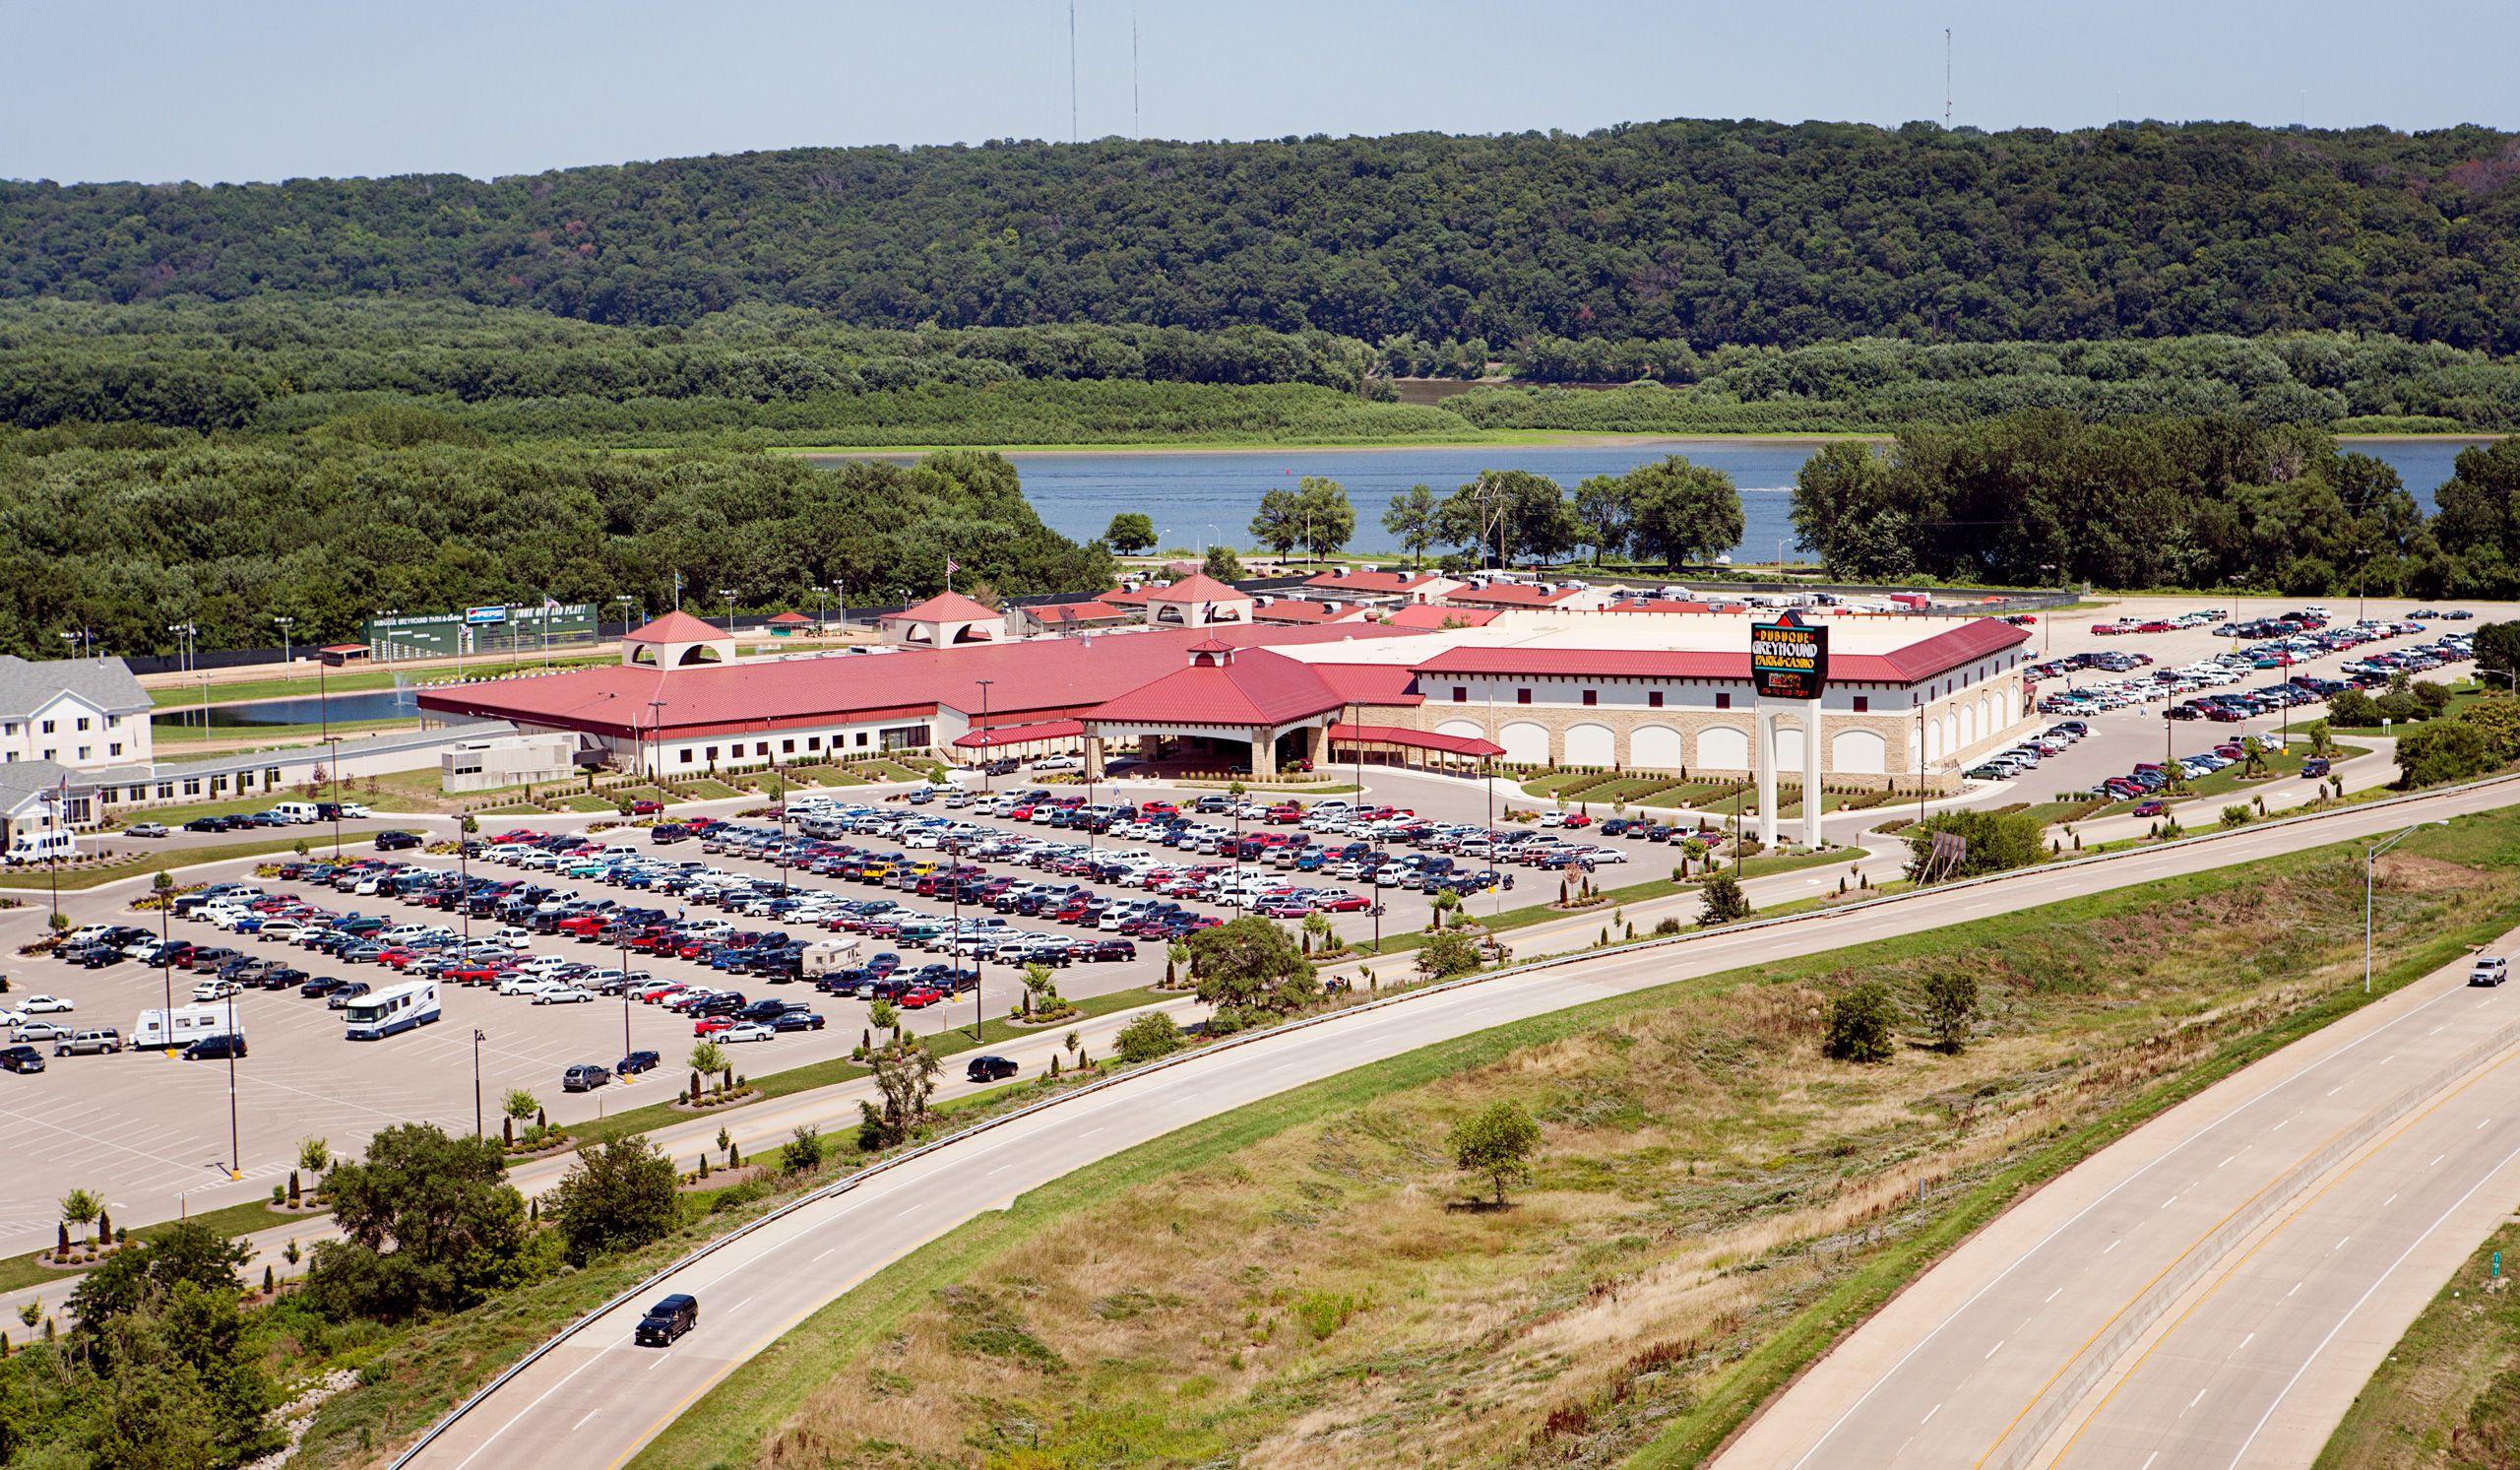 Aerial of Casino on City Island Dubuque, Iowa